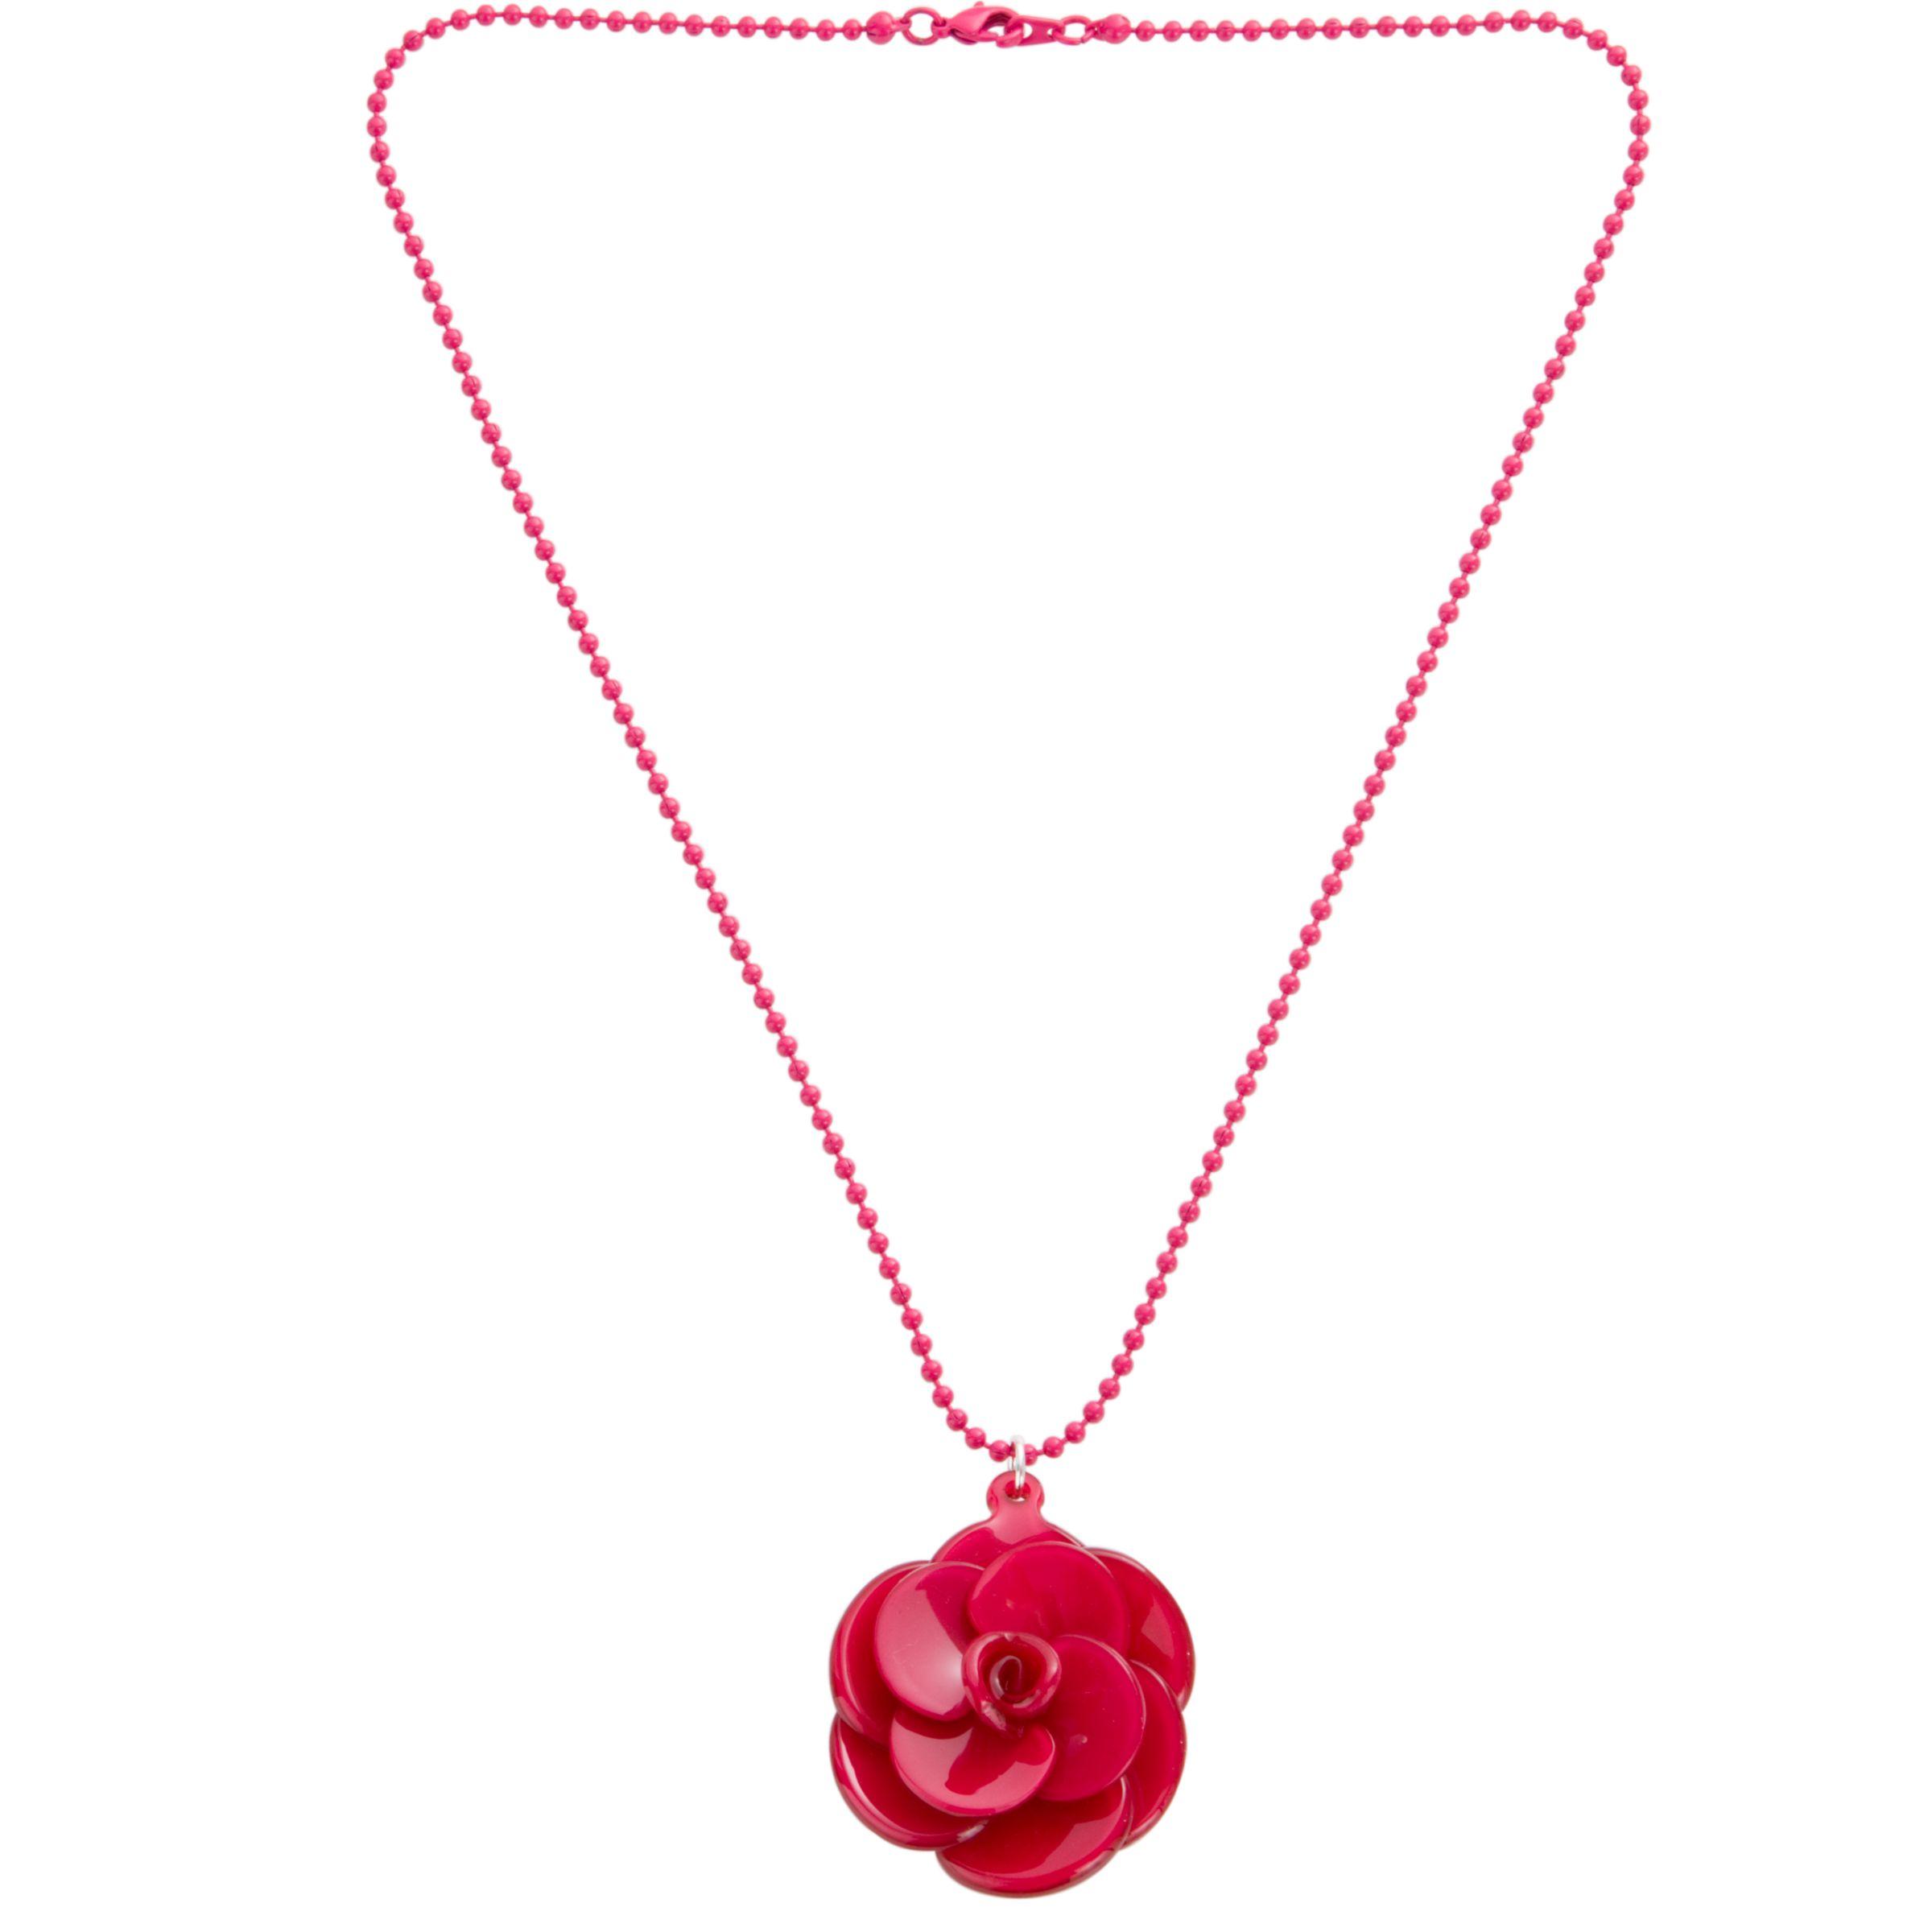 Big Baby Small Rosette Fuchsia Flower Pendant Necklace